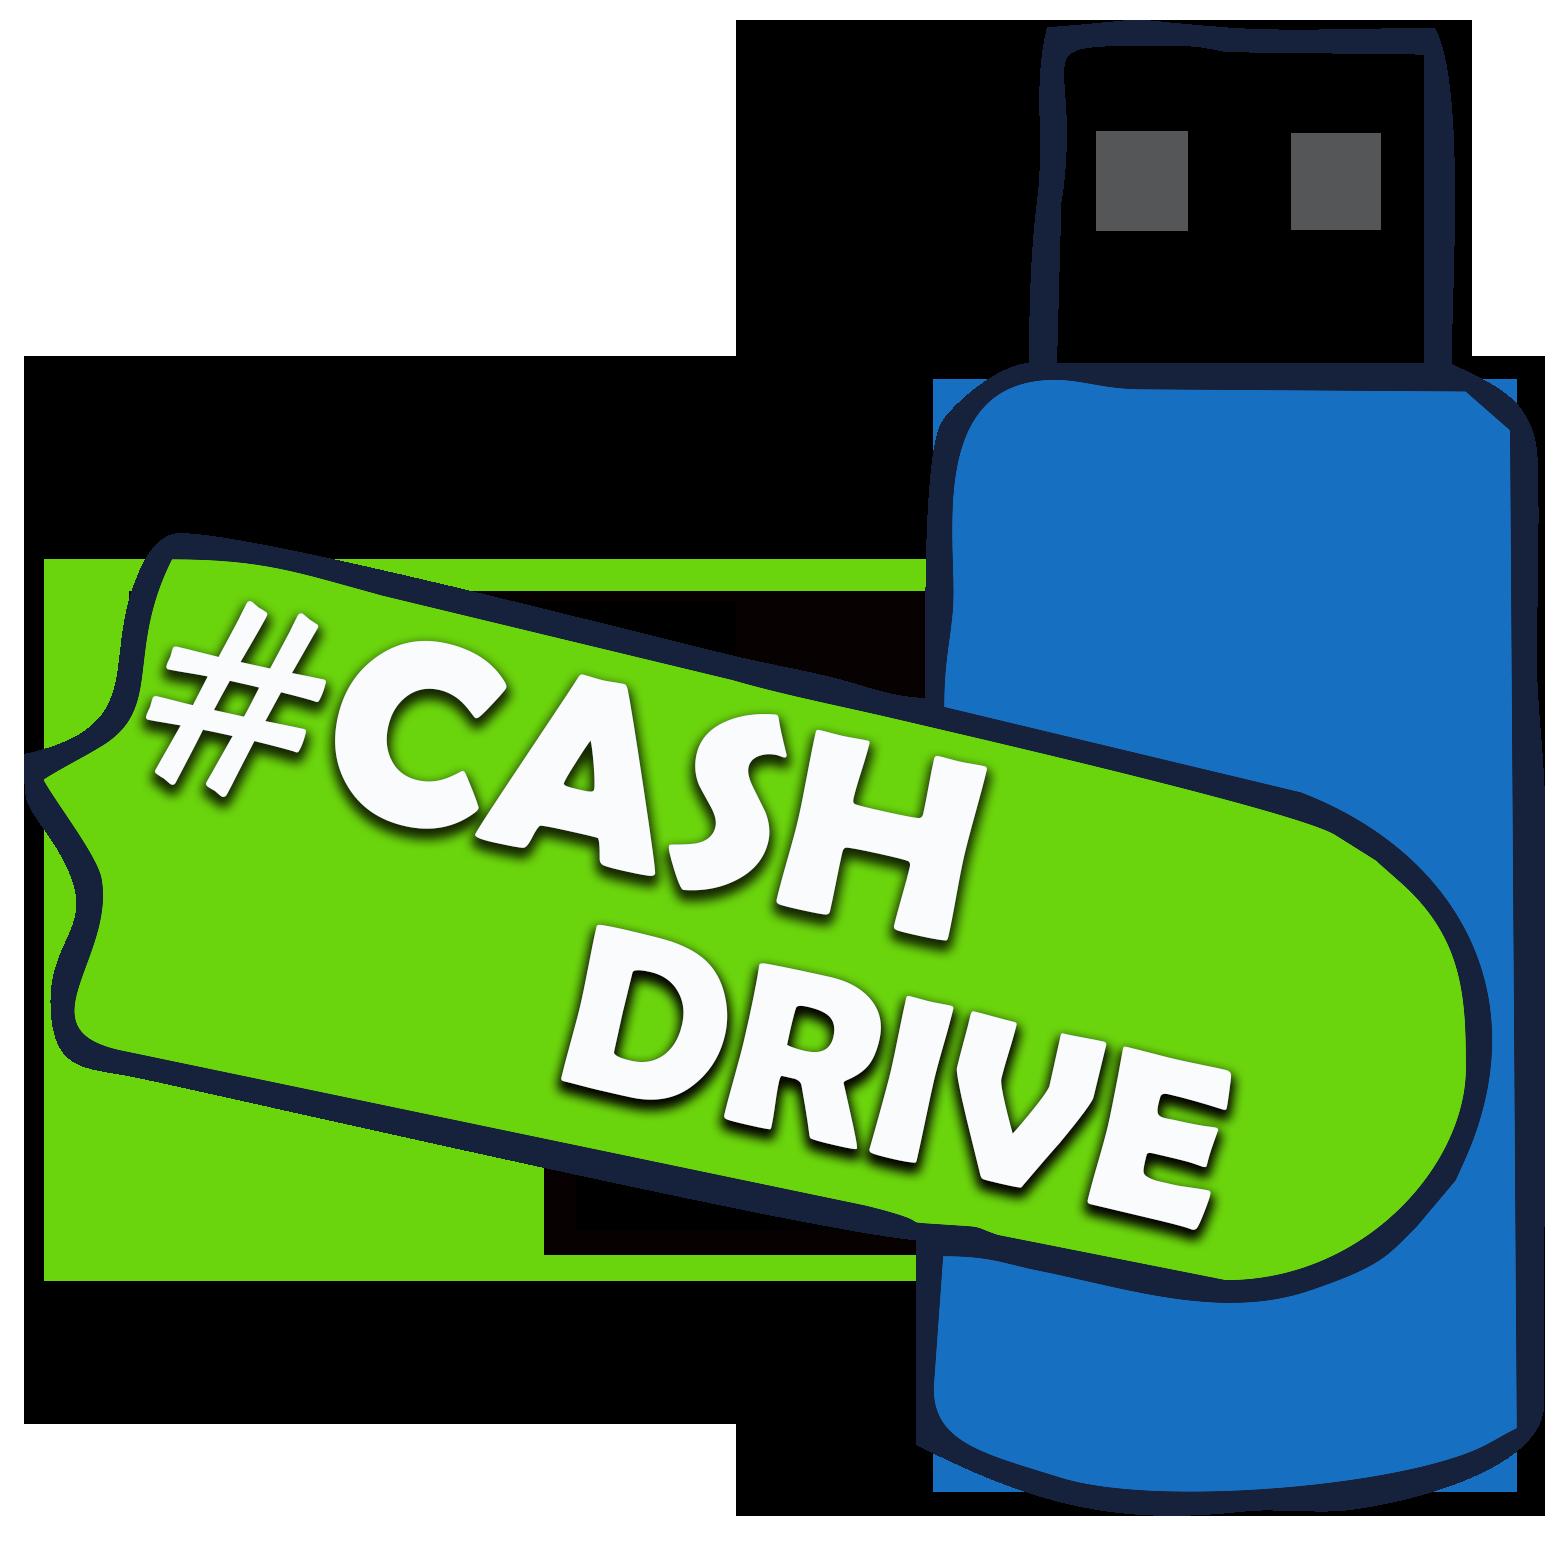 Voucher #Cashdrivepresente - Para Presentear Fotógrafos 8 GB